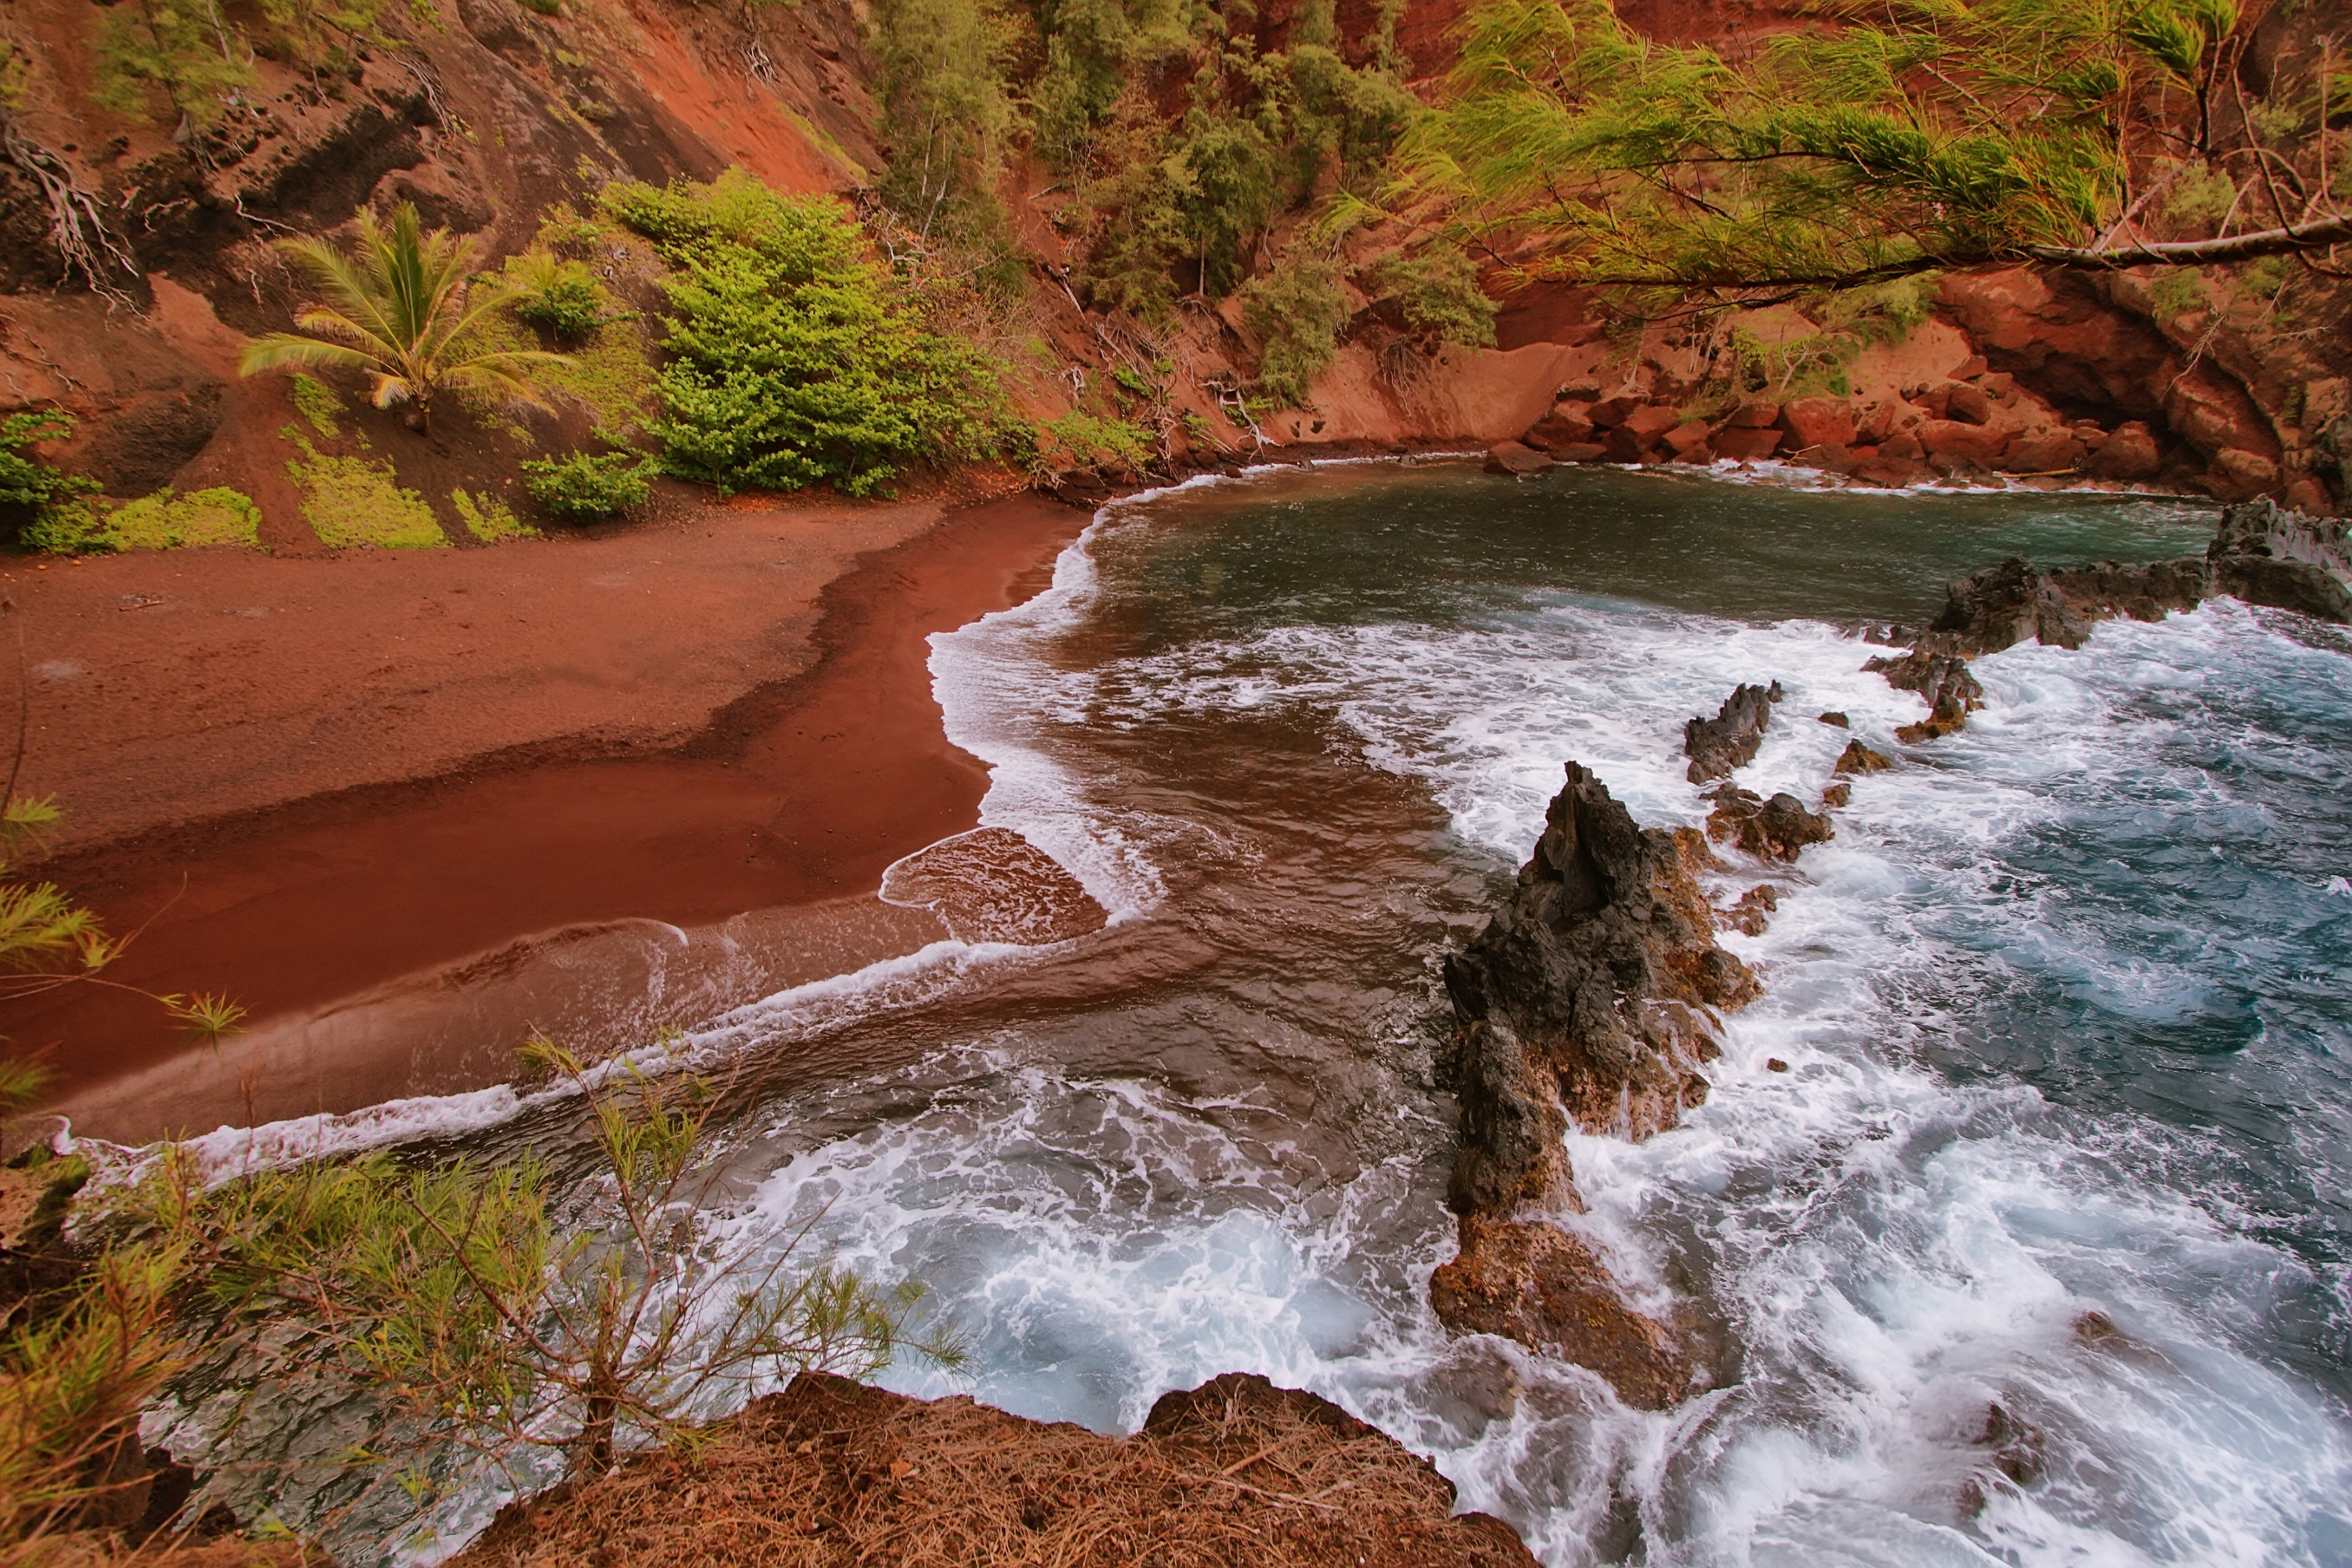 Red Sand Beach, Hana, Hawaii, United States of America